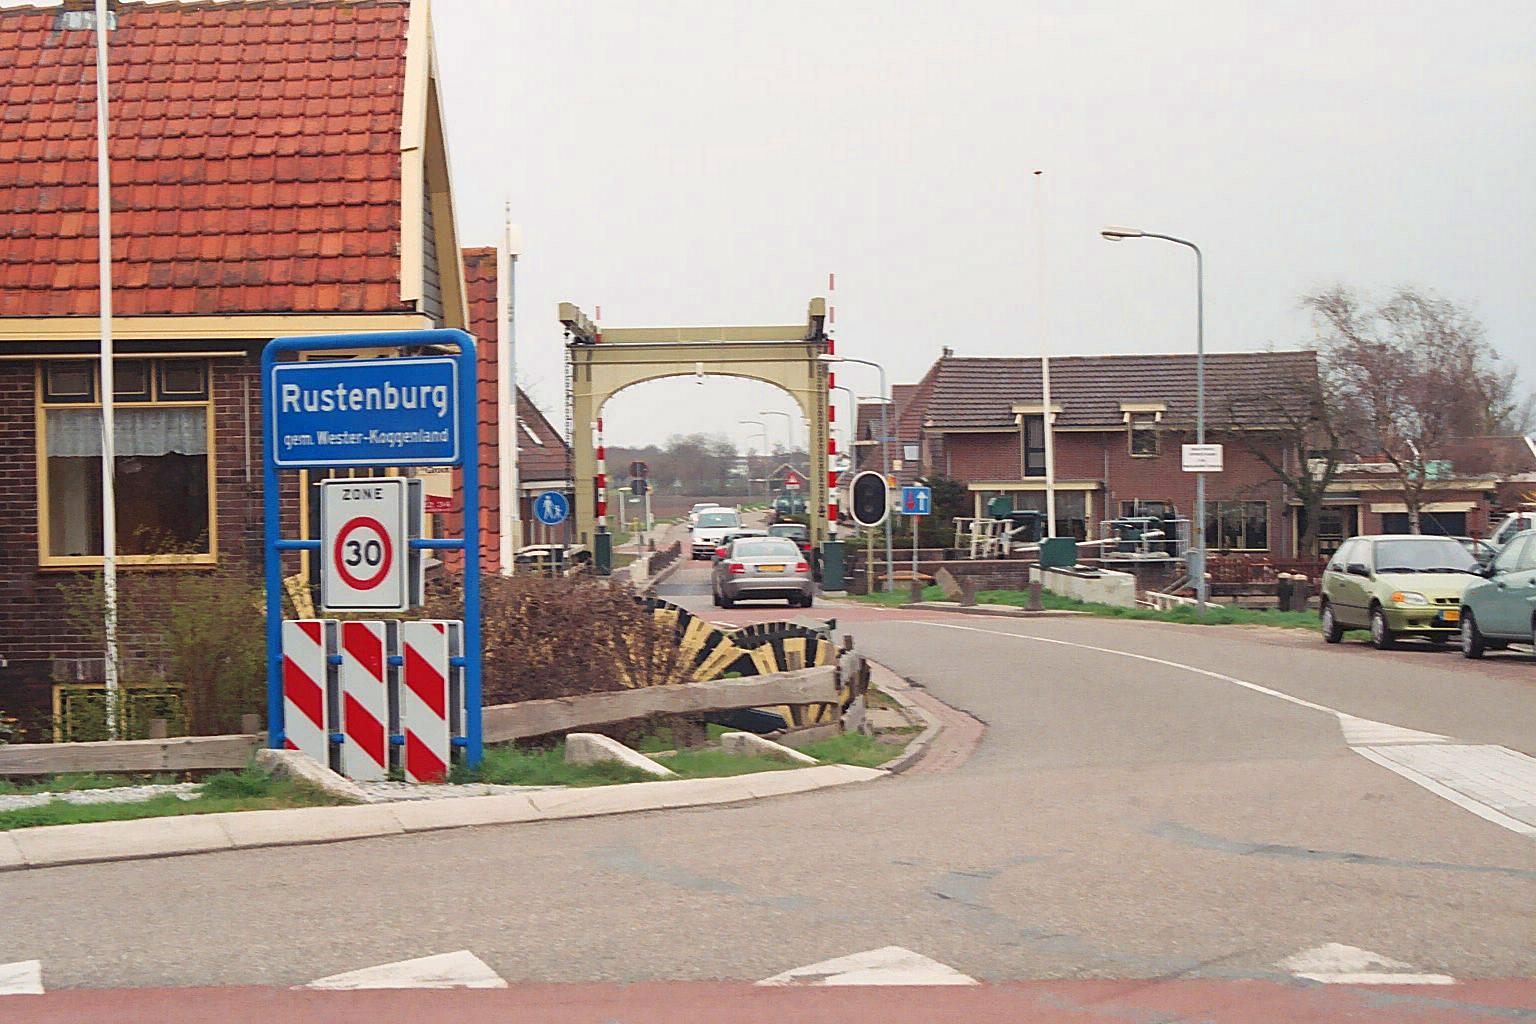 Rustenburg dating service Over50 Dating In Rustenburg - 50 Singles